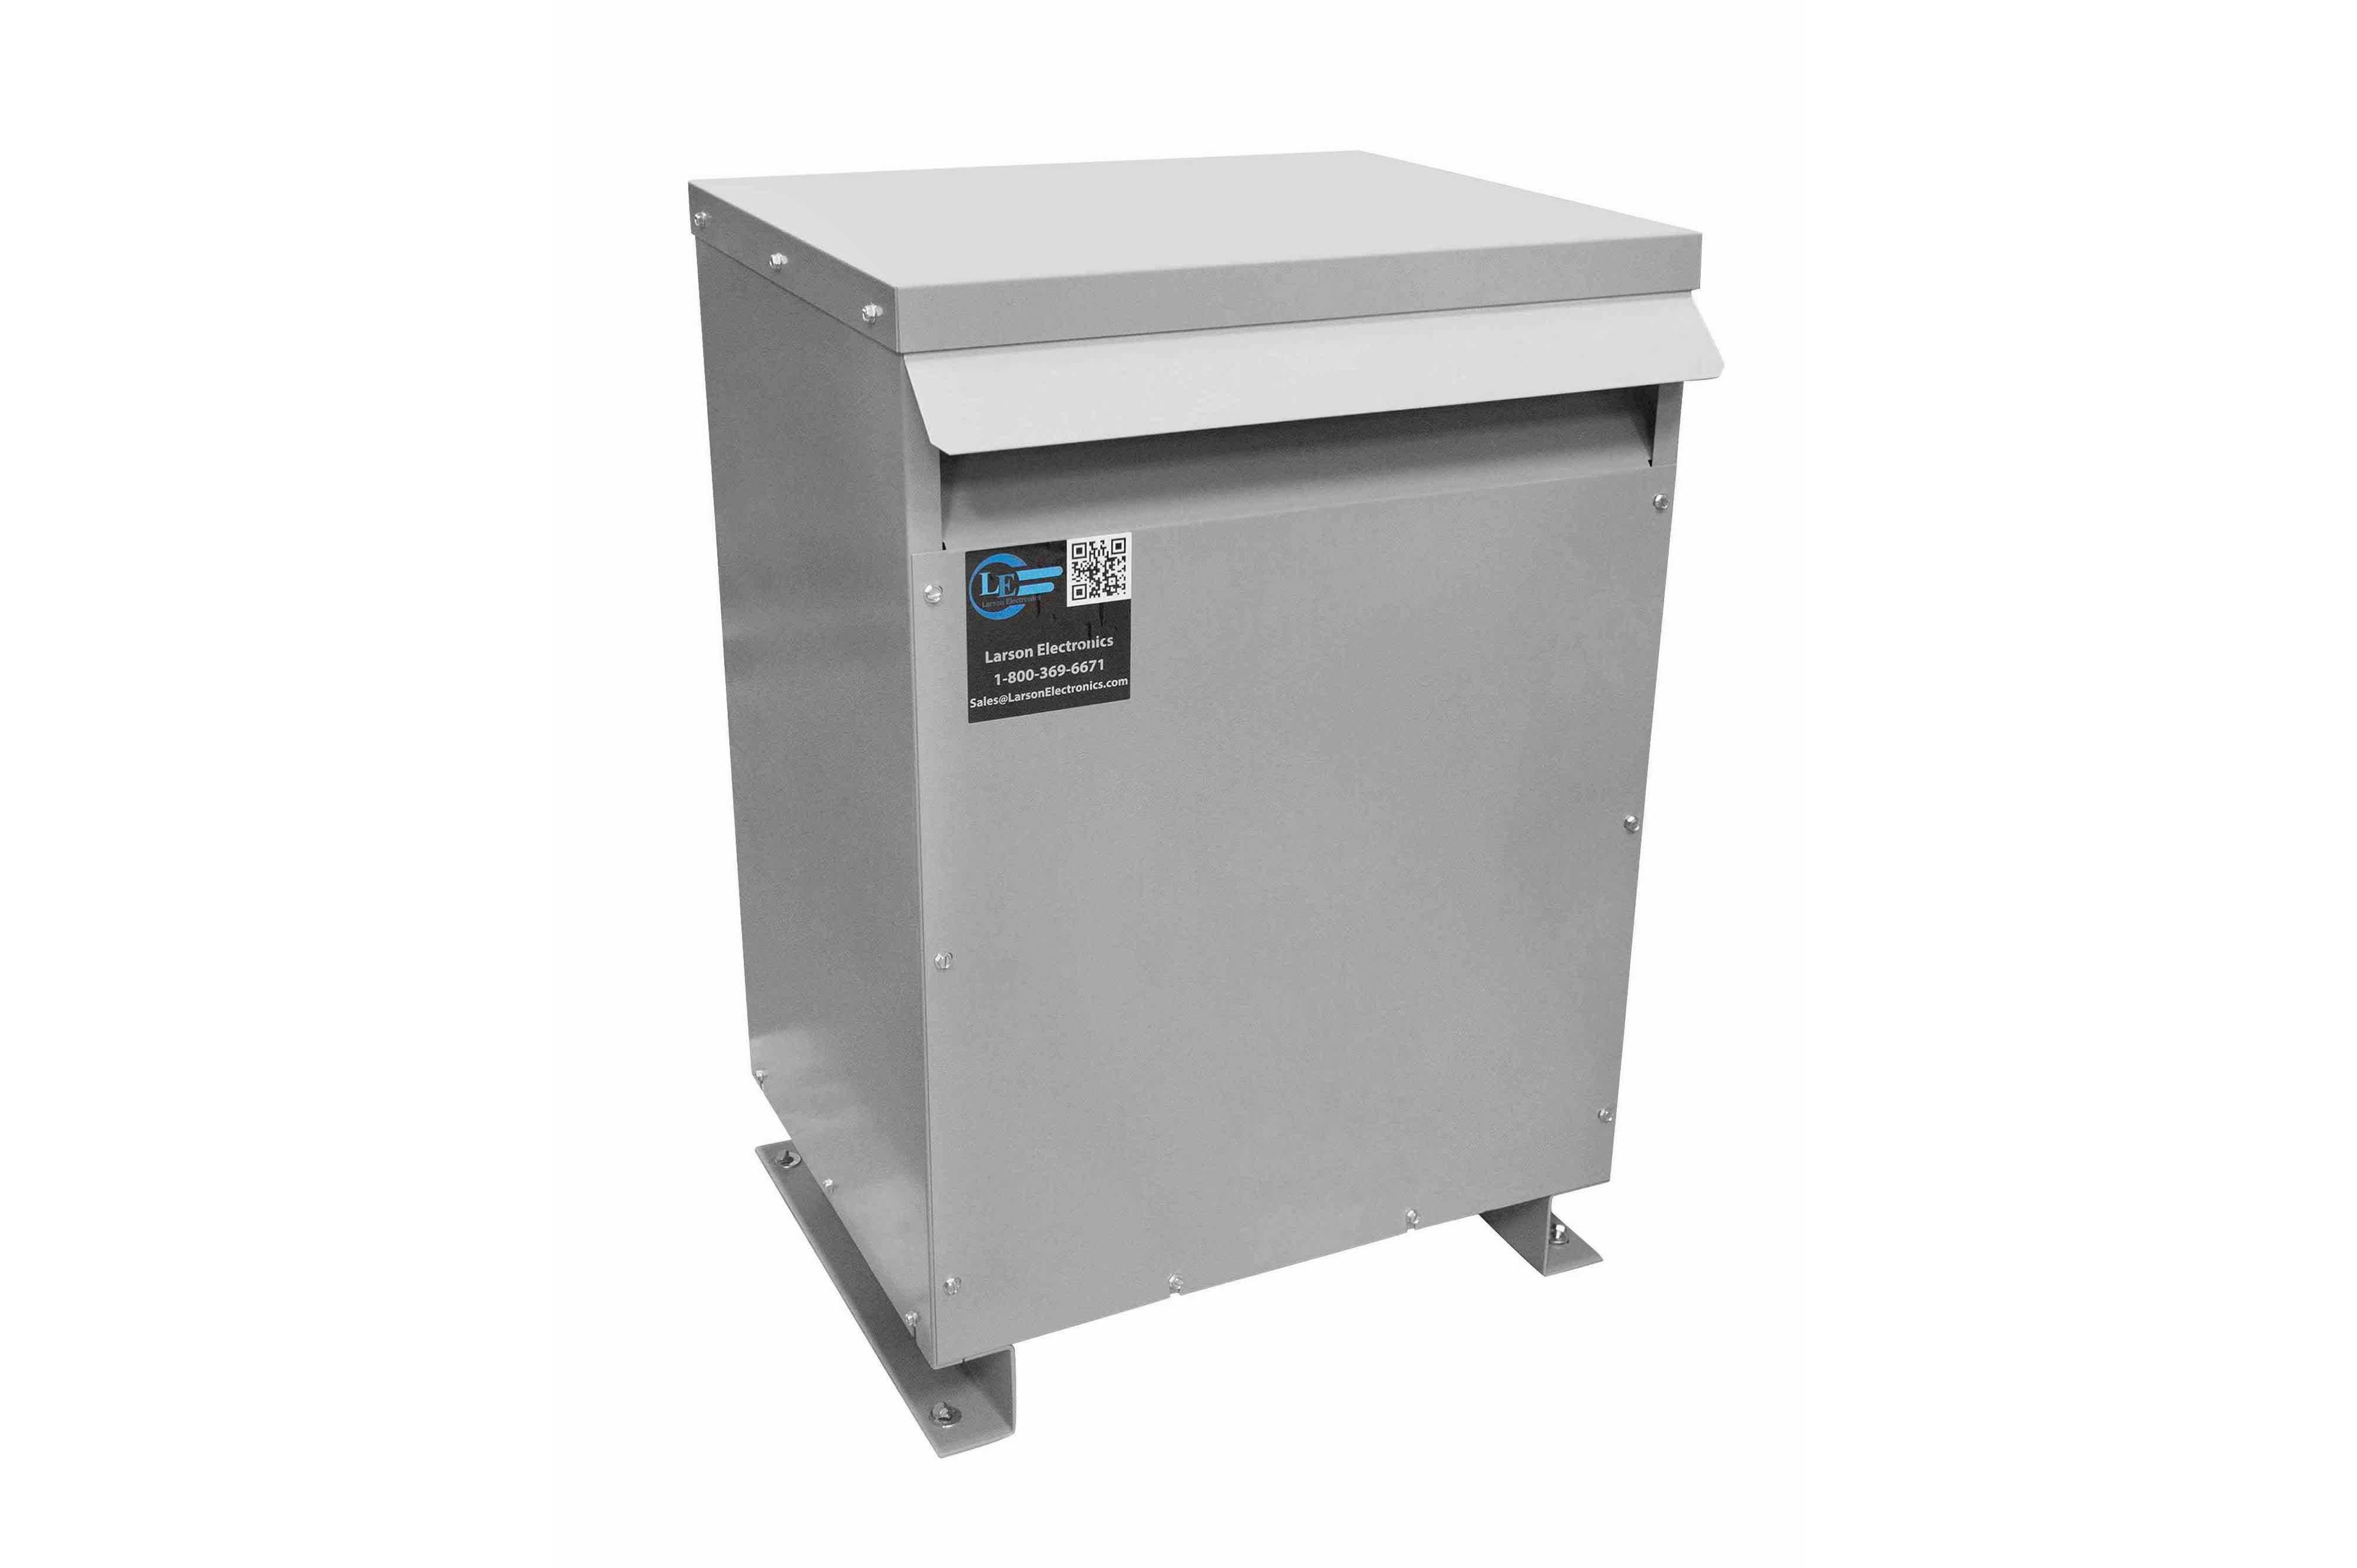 115 kVA 3PH Isolation Transformer, 415V Wye Primary, 480Y/277 Wye-N Secondary, N3R, Ventilated, 60 Hz